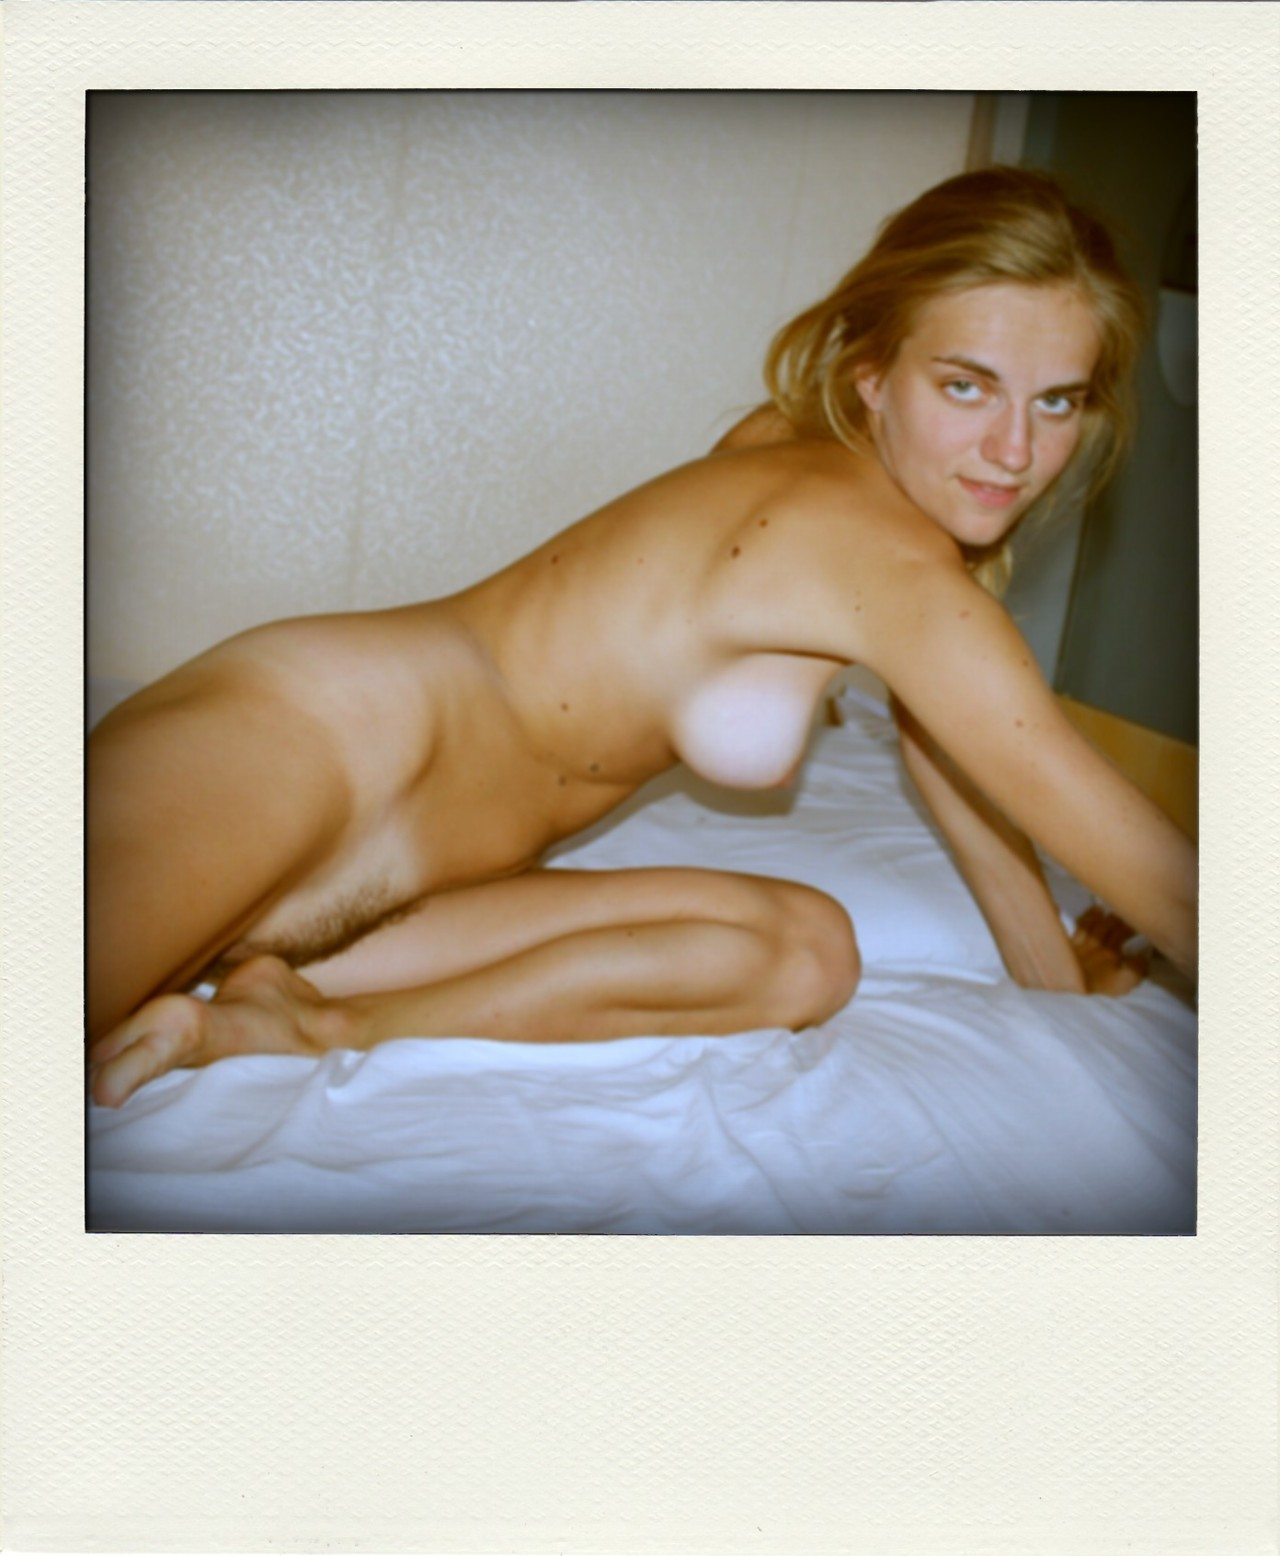 embarrassed polaroid nude